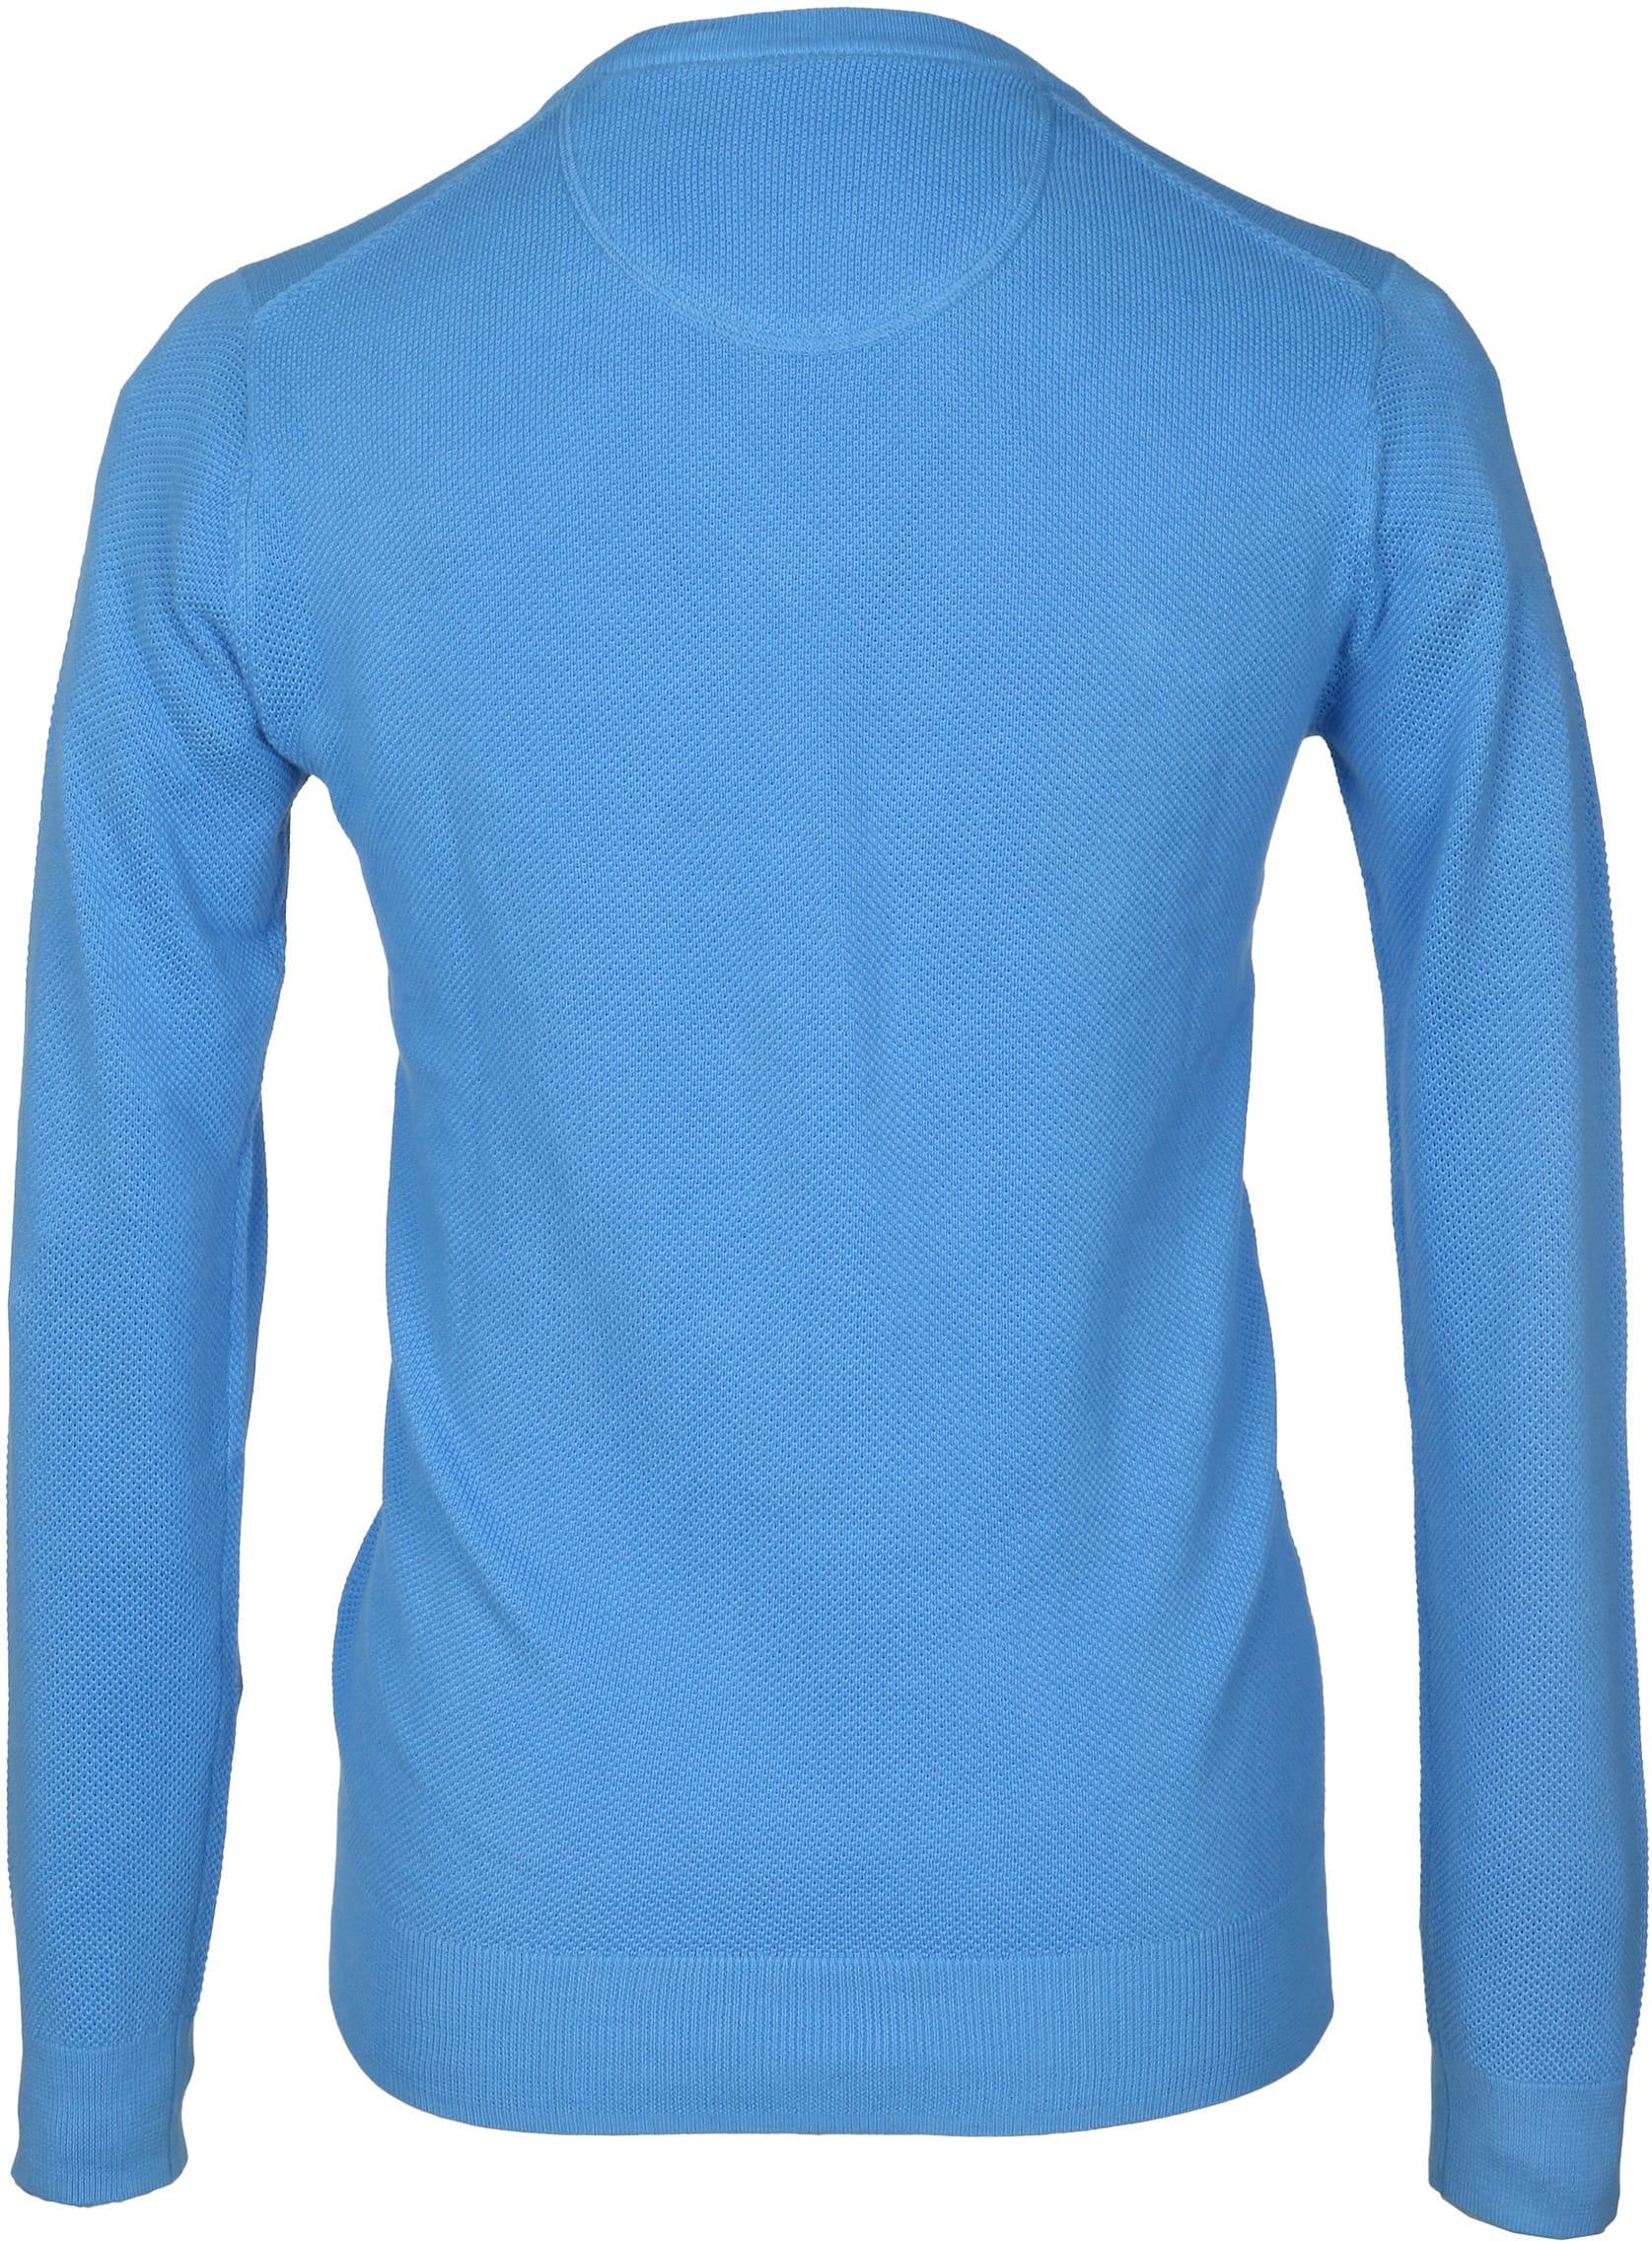 Gant Pullover Blau V-Ausschnitt foto 2